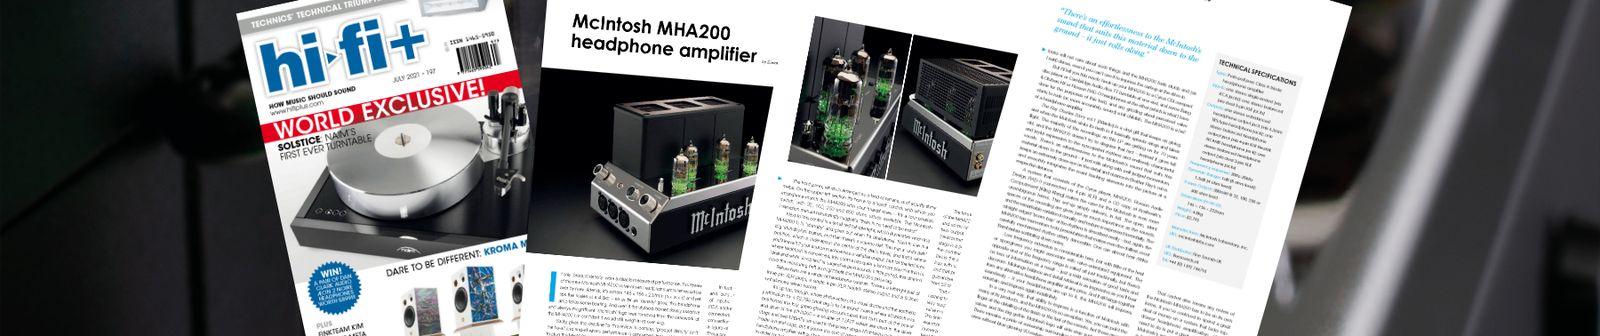 Fsweb hifiplus mha200 1